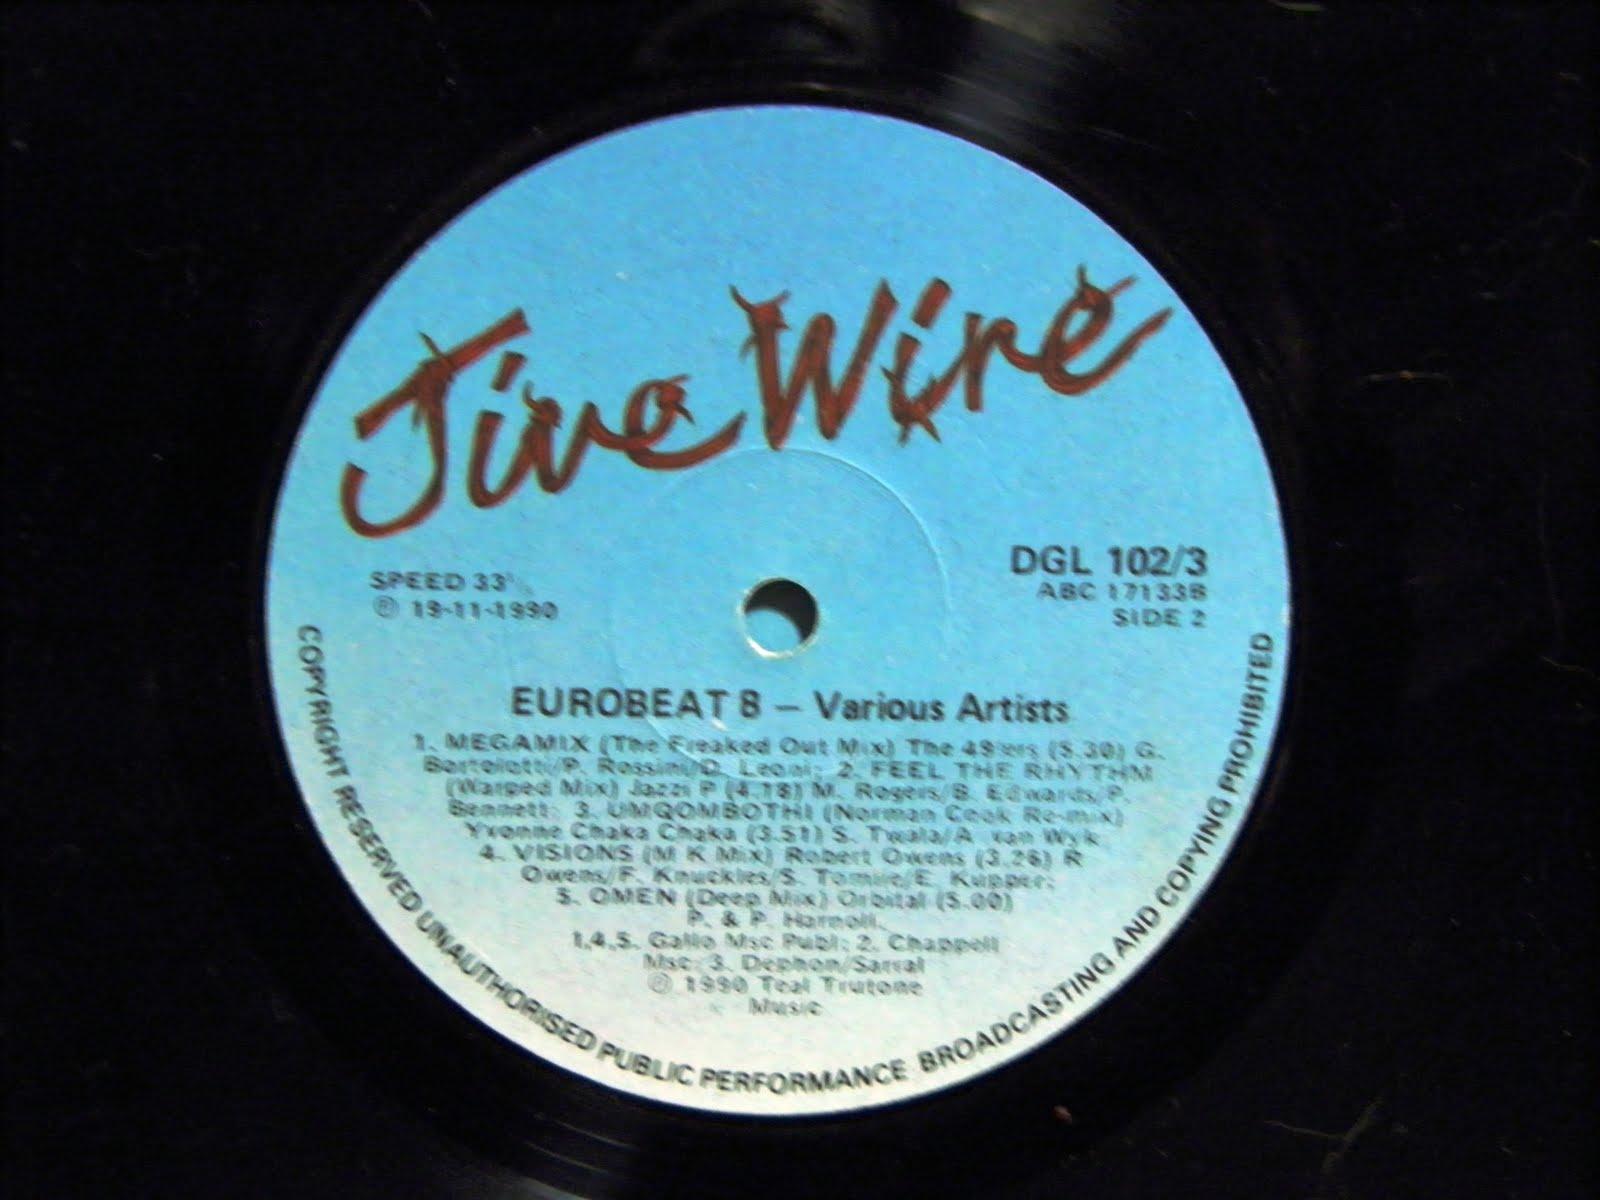 Eurobeat volume 8 90 minute non stop dance remix 2lp for Classic 90s house vol 2